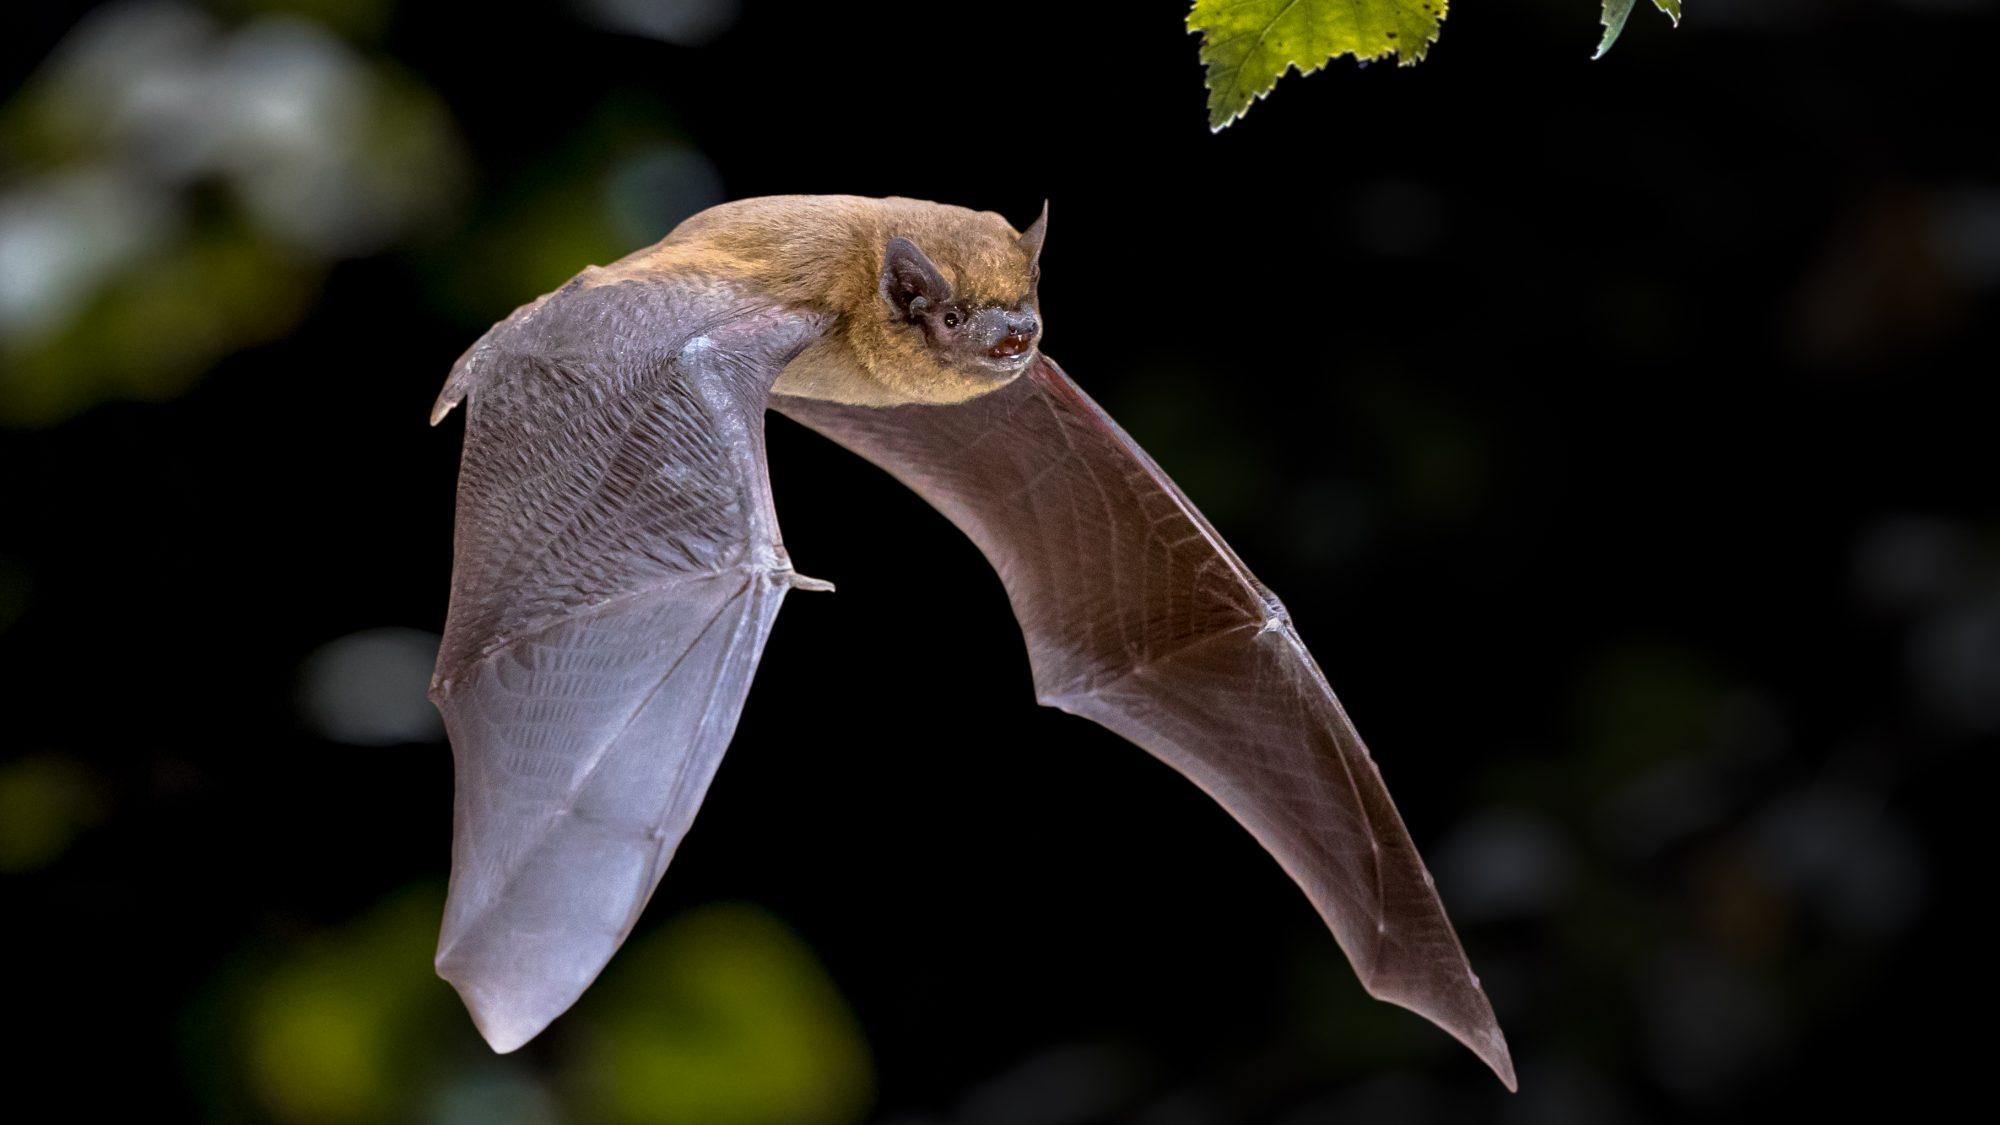 A bat flying.